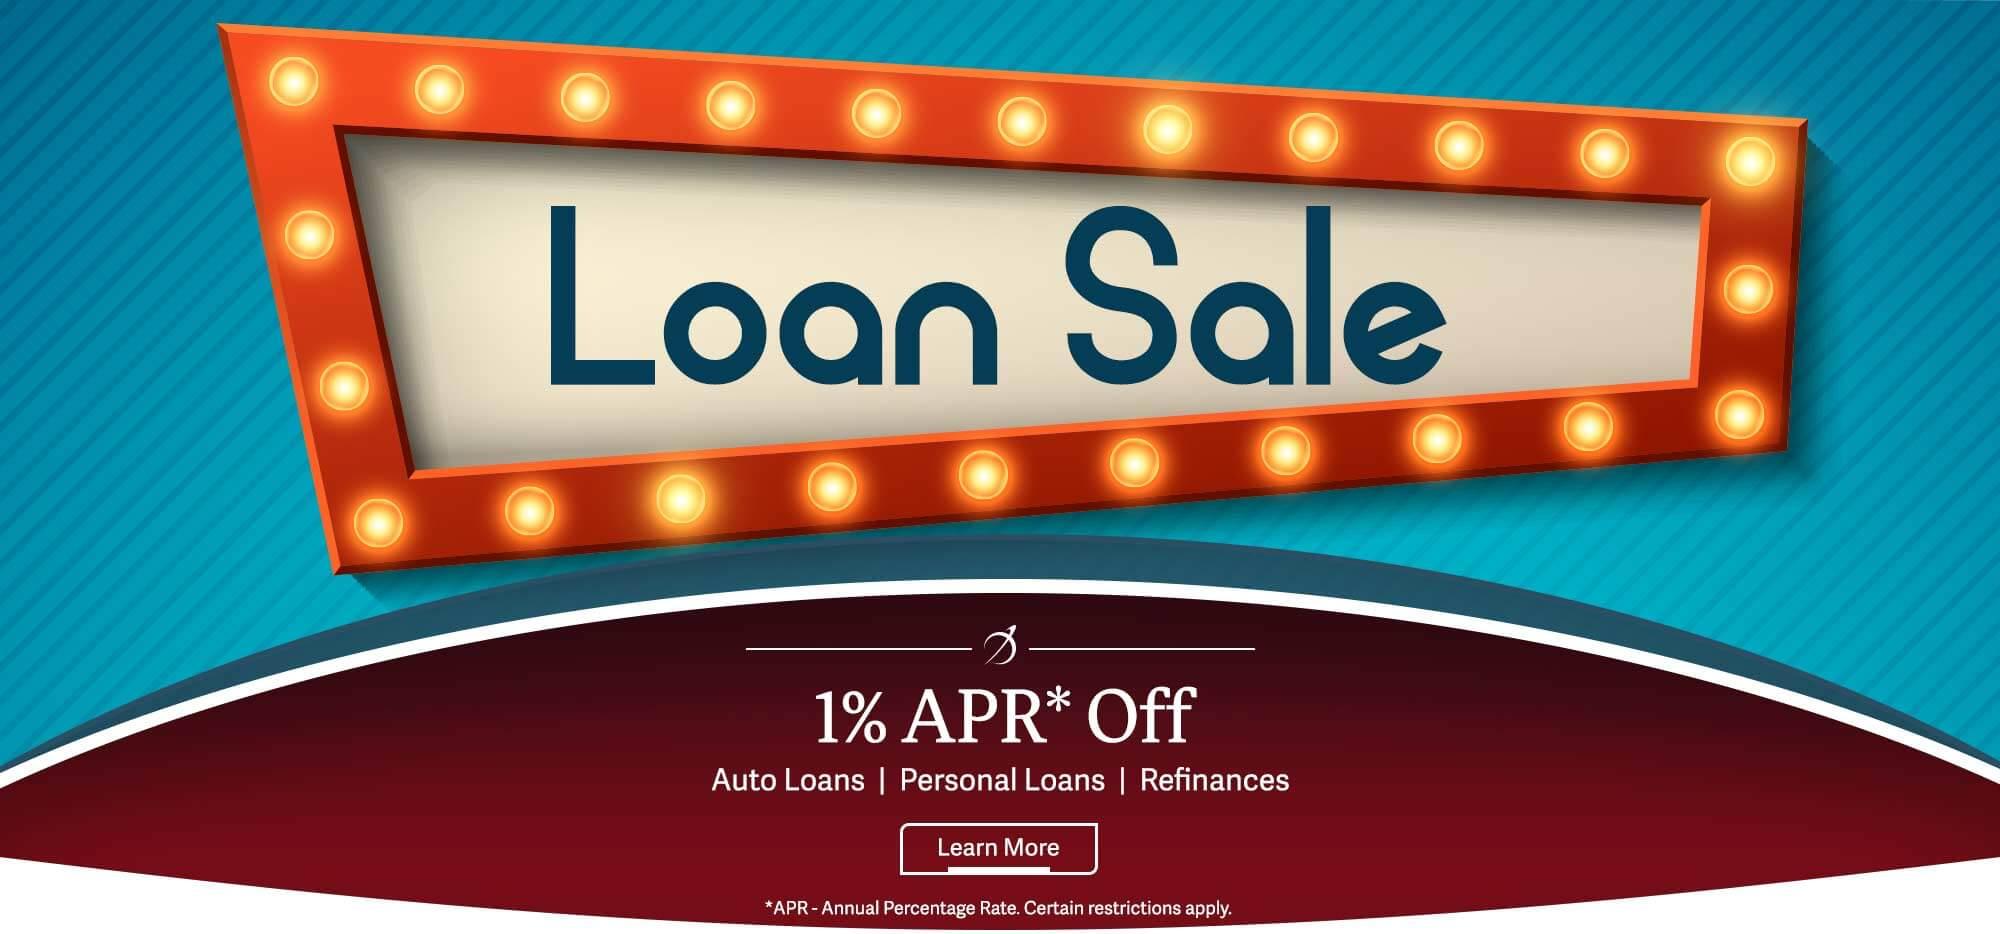 Loan Sale April 22nd-April 24th